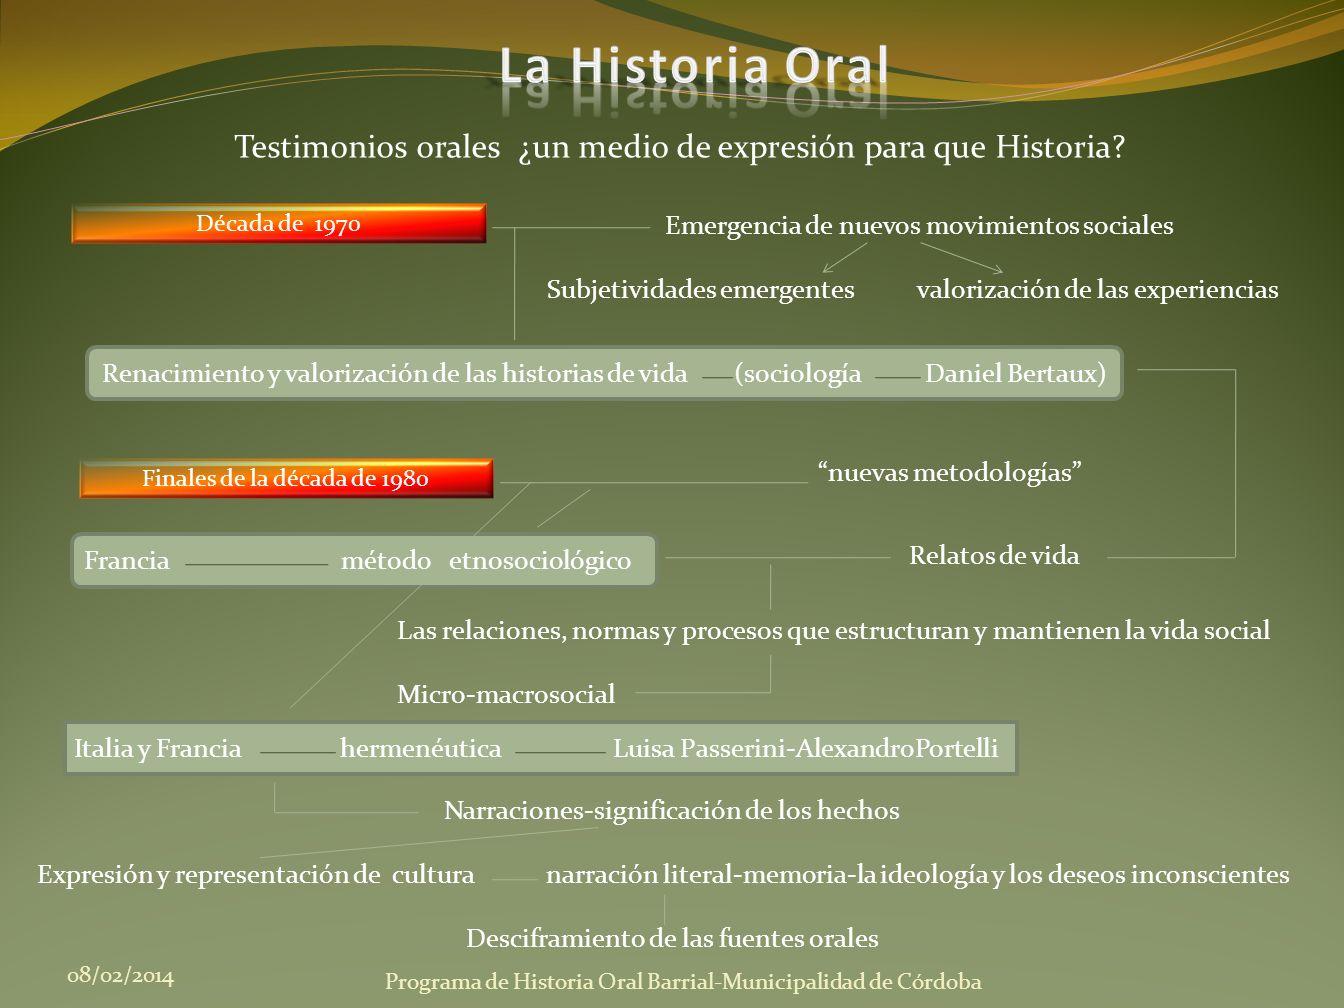 Década de 1970 08/02/2014 Programa de Historia Oral Barrial-Municipalidad de Córdoba Testimonios orales ¿un medio de expresión para que Historia? Rena